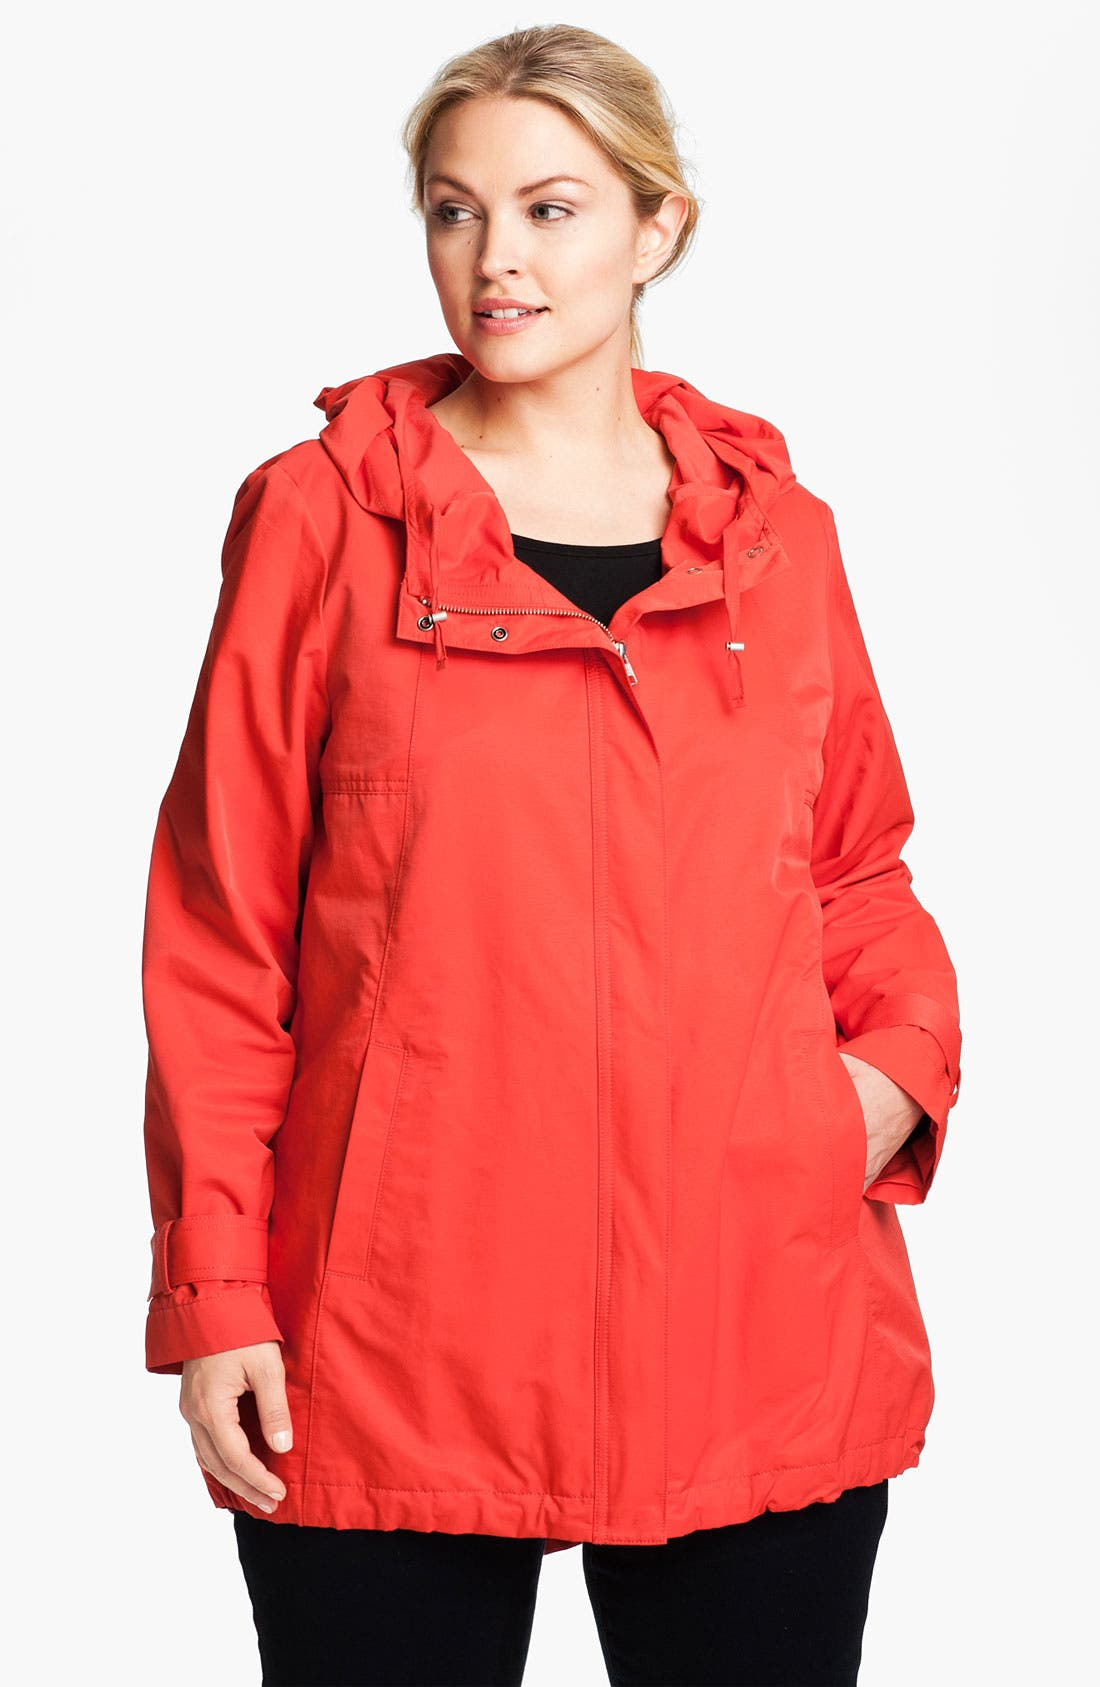 Alternate Image 1 Selected - Eileen Fisher Hooded Jacket (Plus)